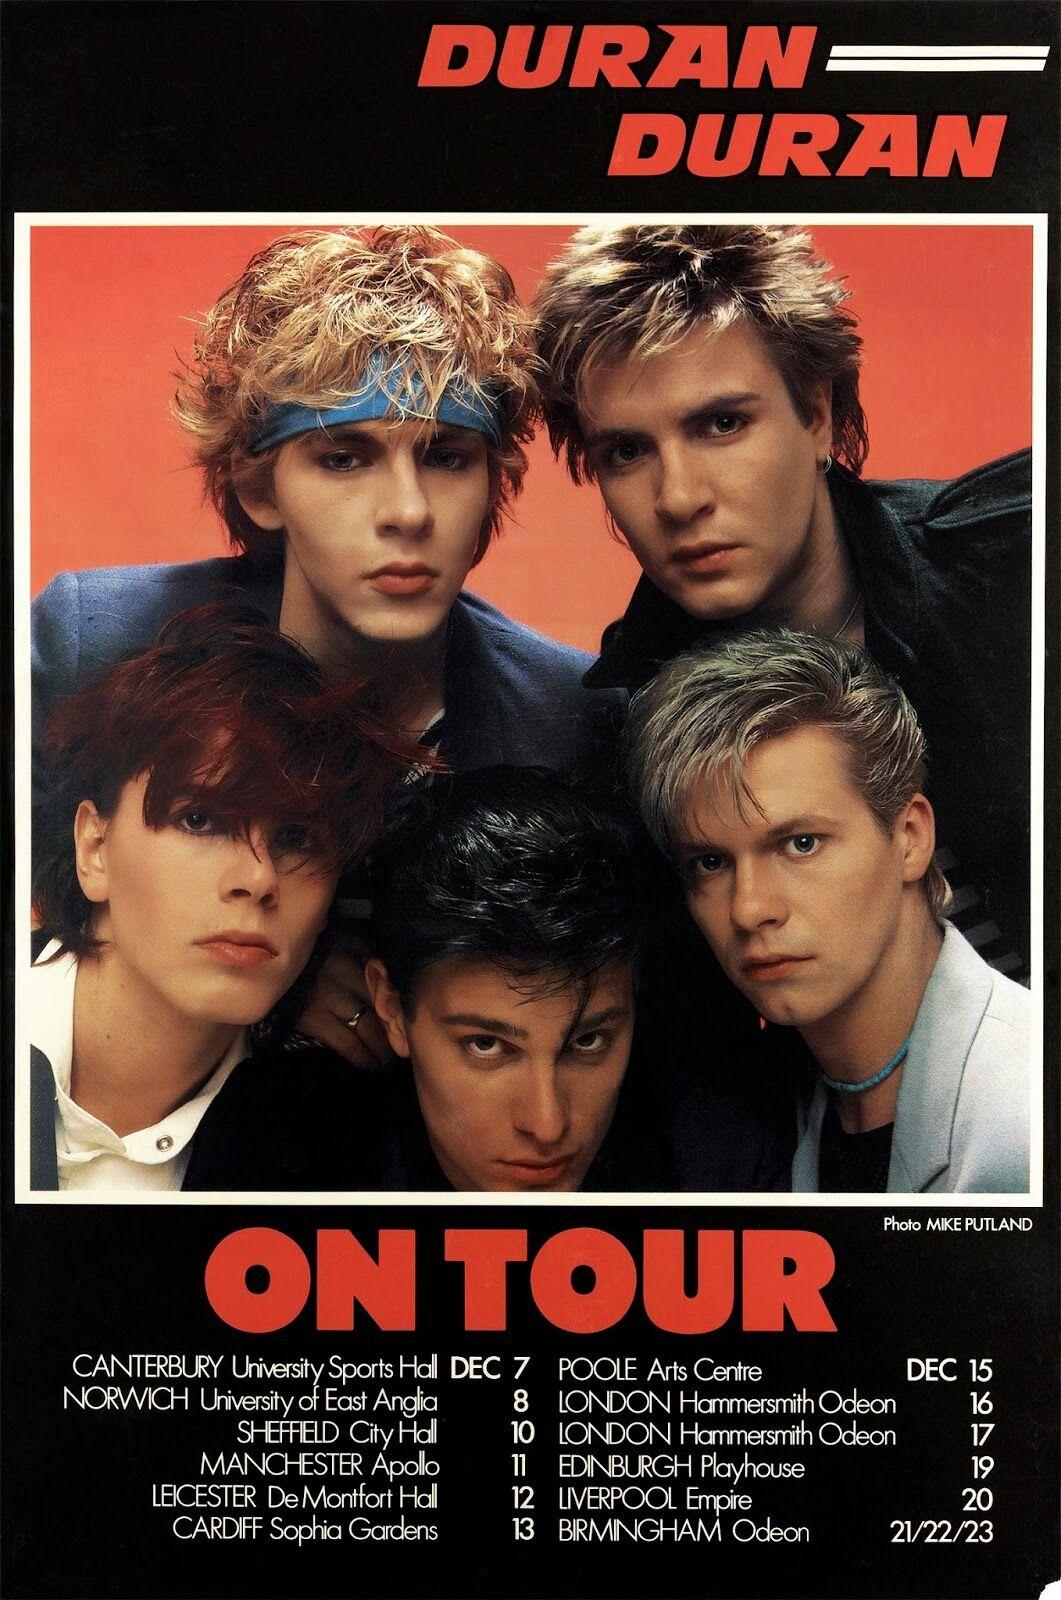 DURAN DURAN ON TOUR 1982 UK CONCERT POSTER-New Wave, Synthpop,Dance-rock Music - $11.99